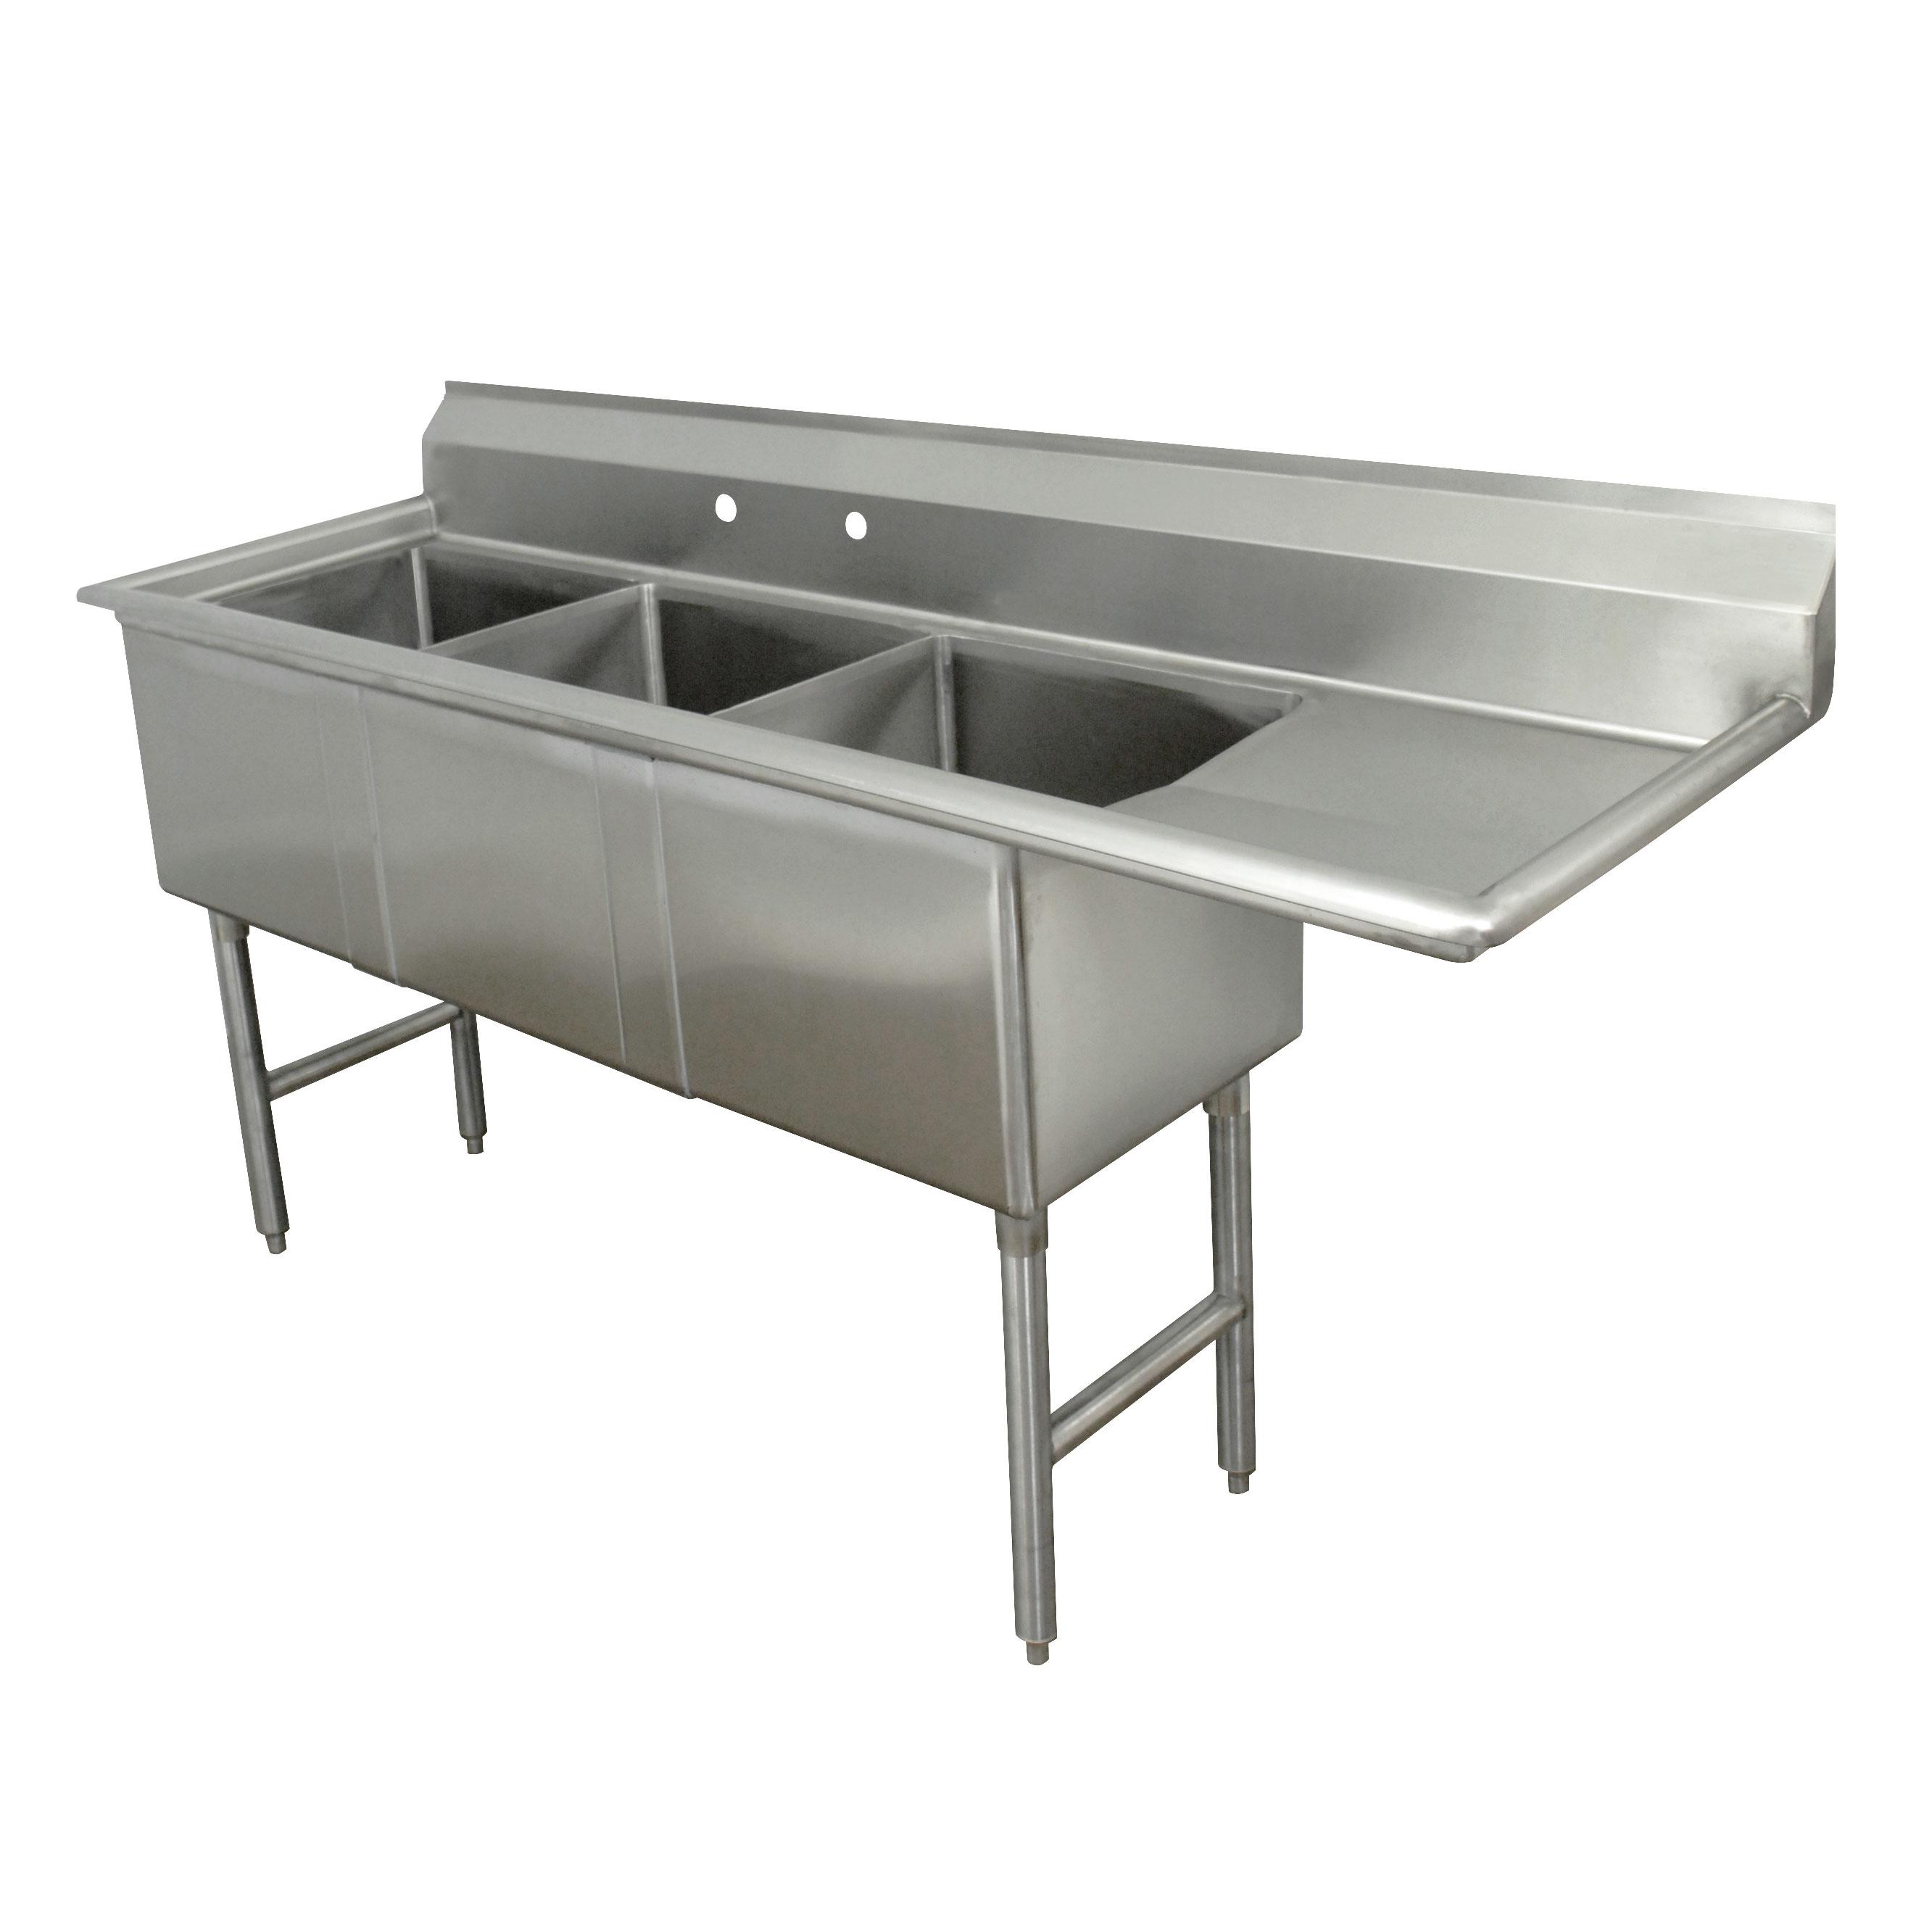 Advance Tabco FC-3-1824-18R-X sink, (3) three compartment